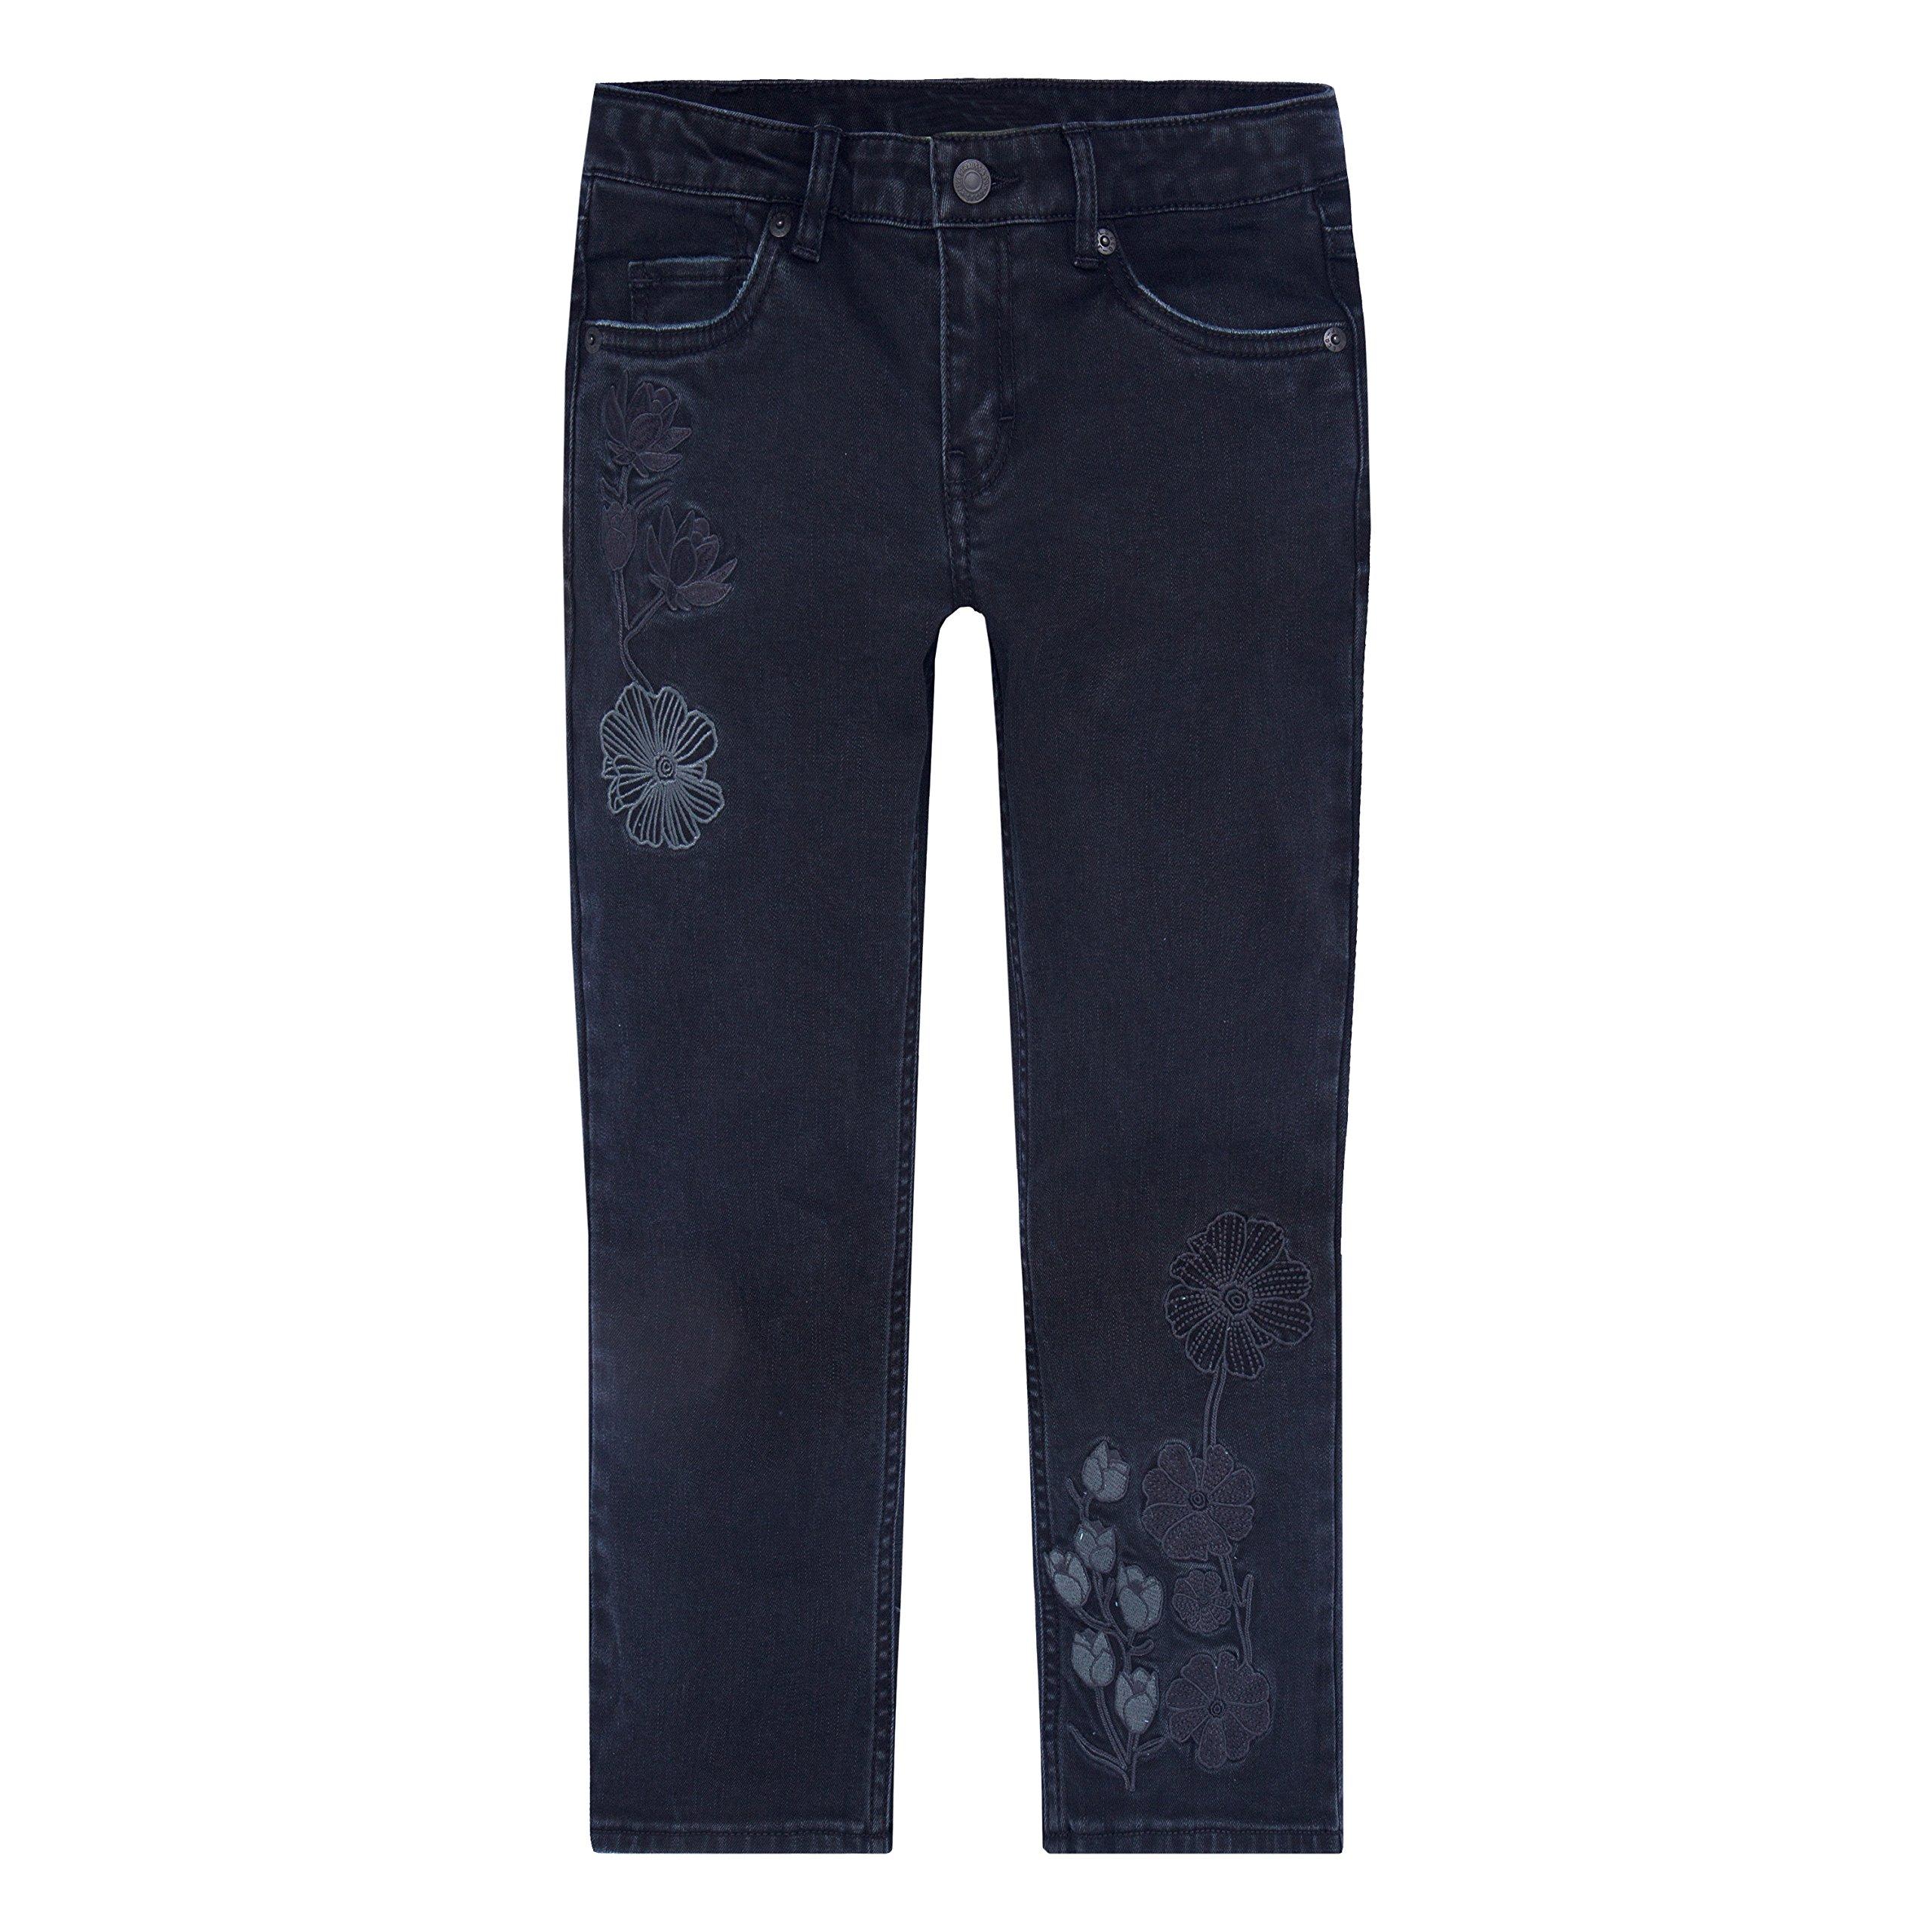 Levi's Girls' Big 715 Bootcut Thick Stitch Jeans, Jet Black, 14